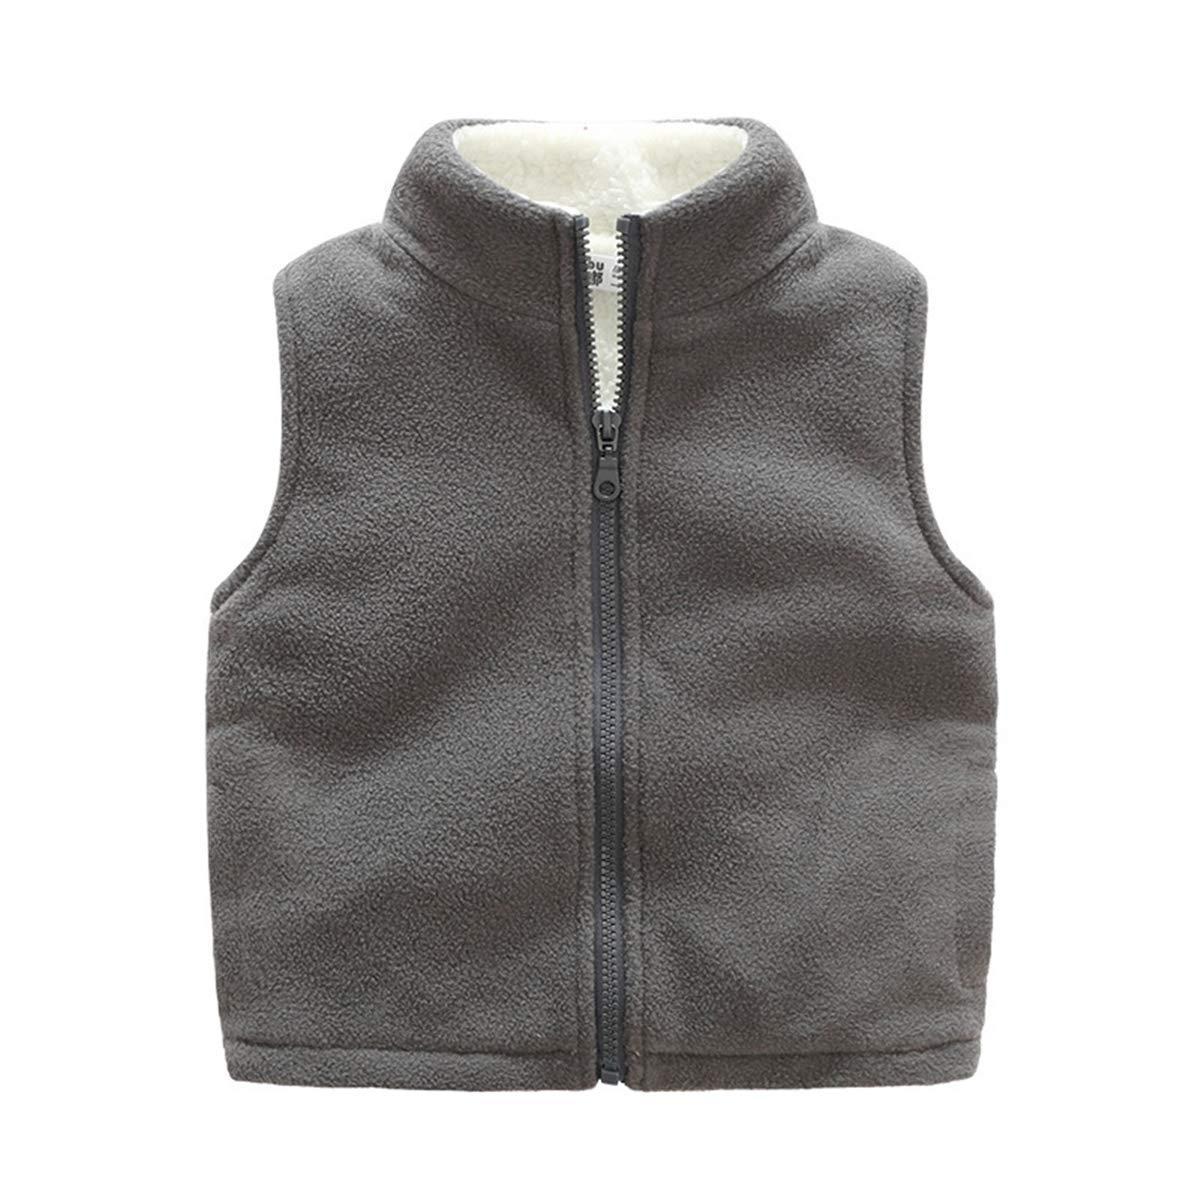 Midudu Fleece Sleeveless Jacket Boy Winter Solid